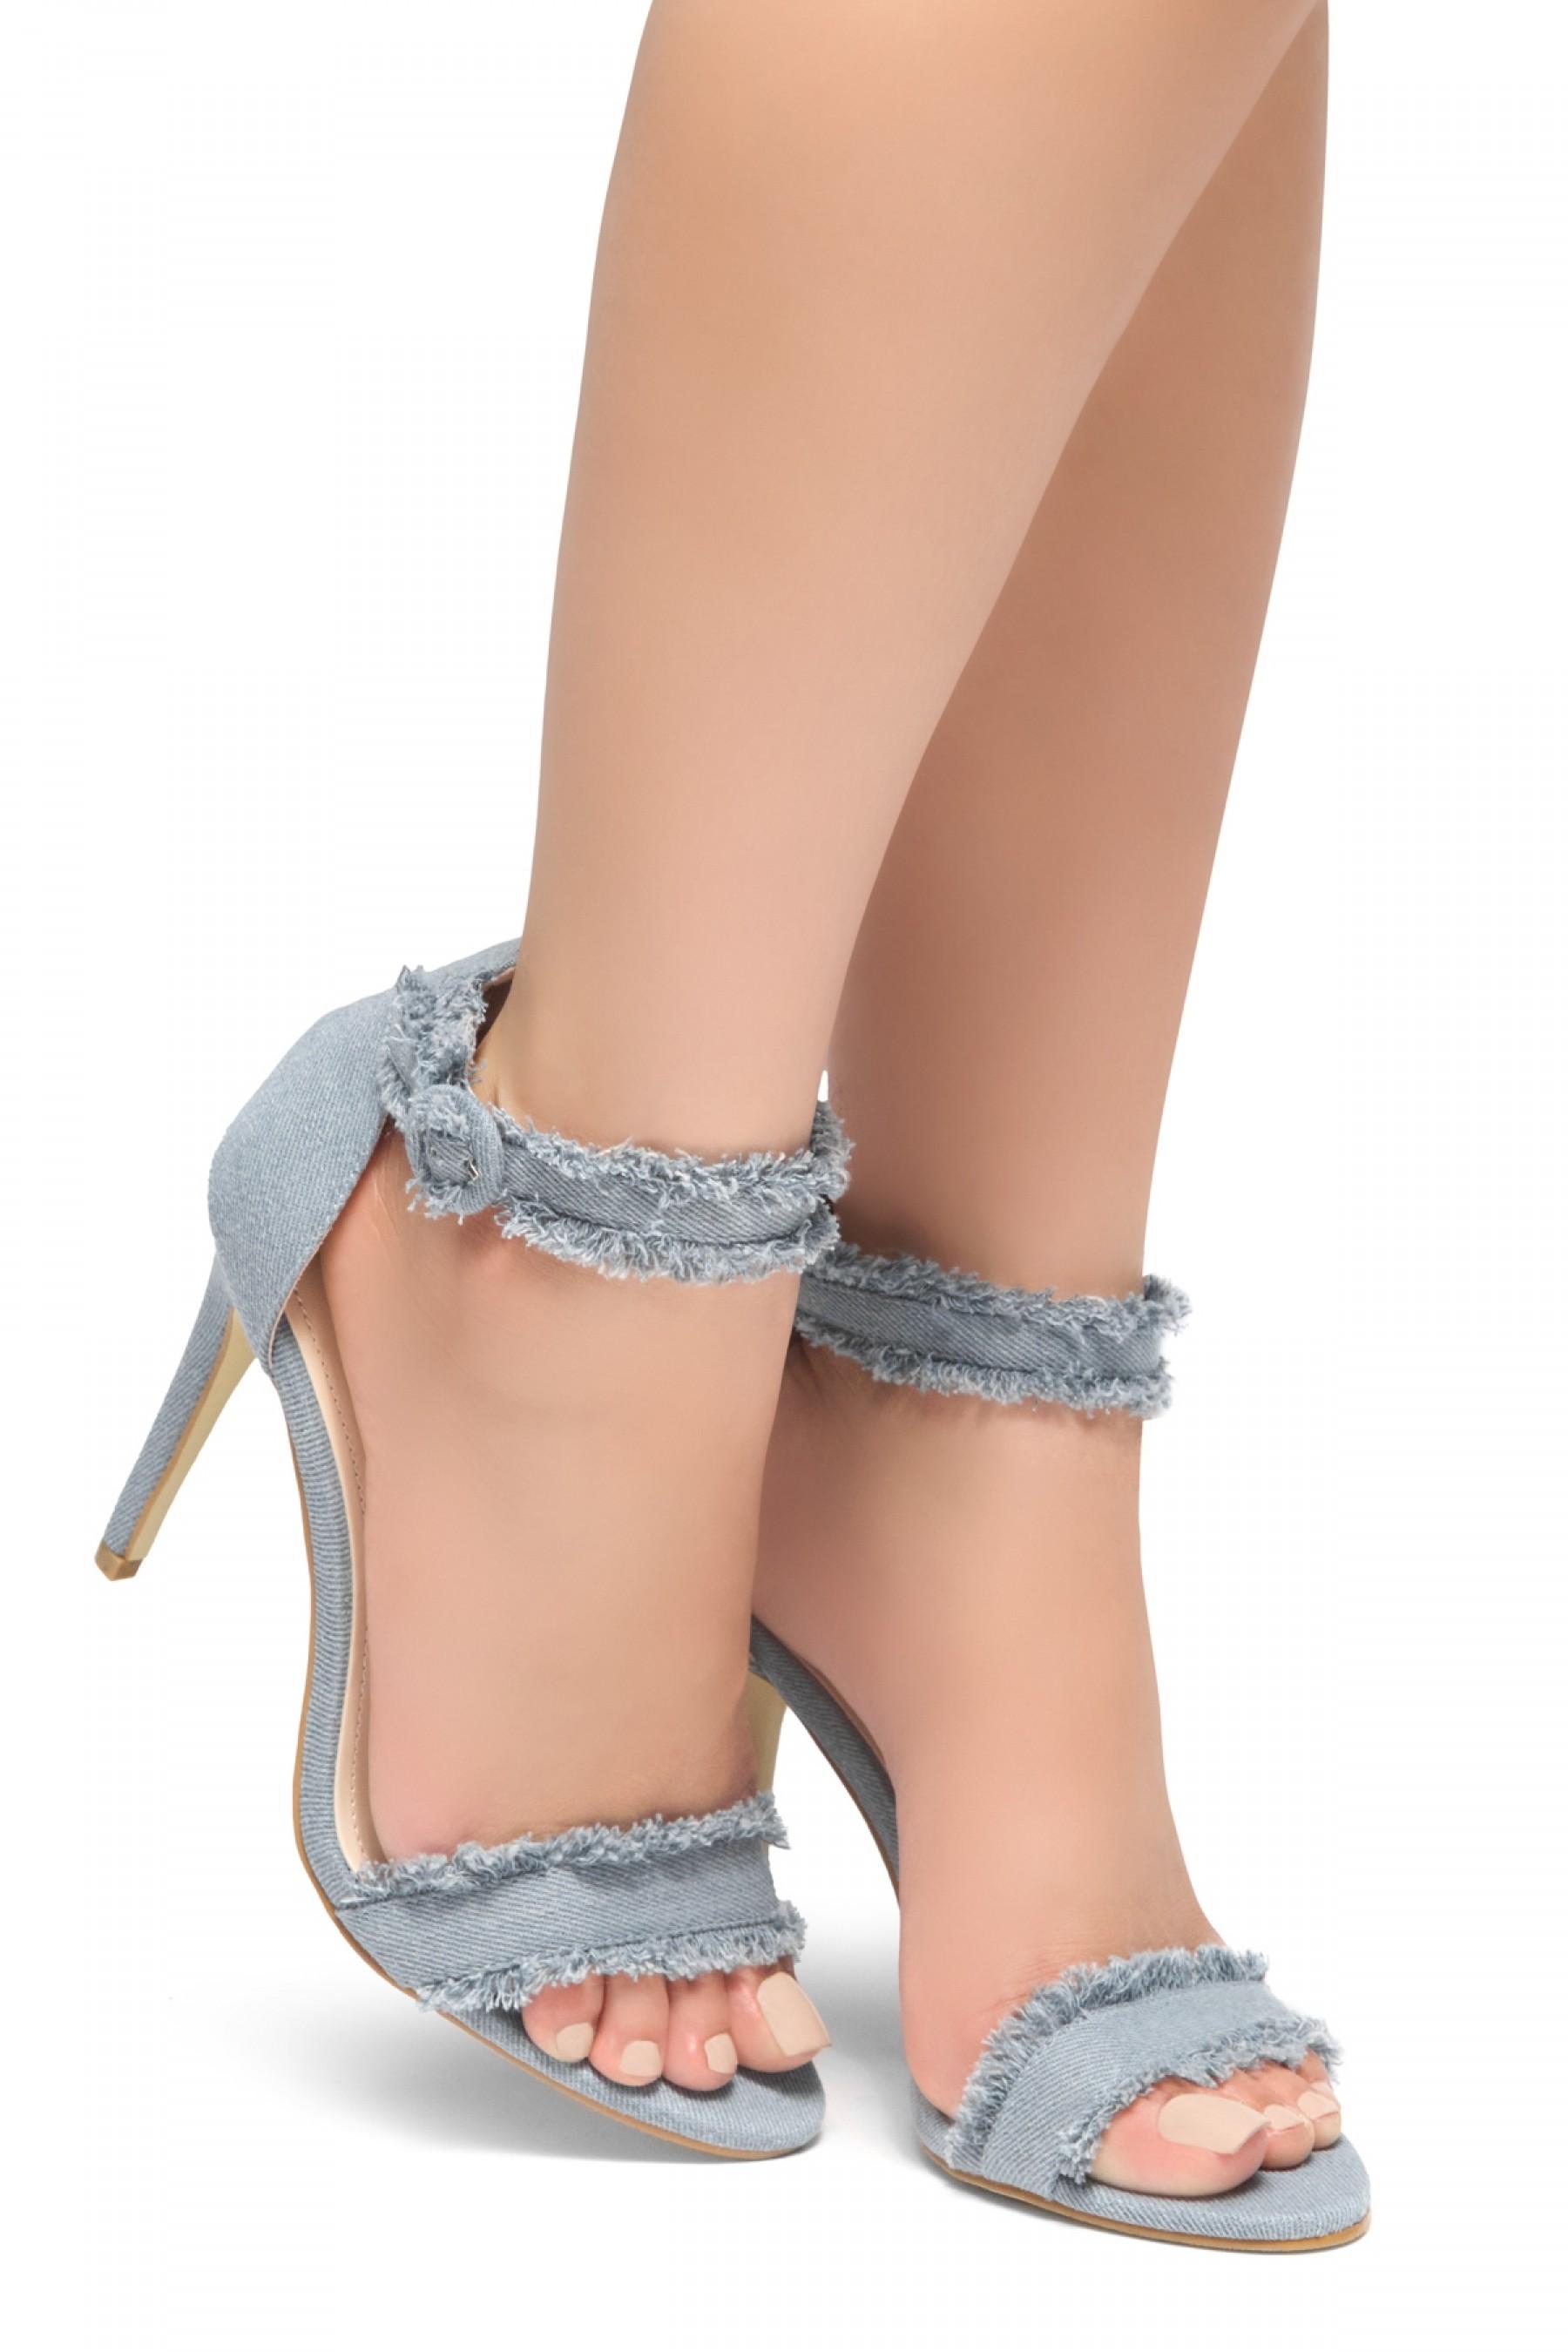 HerStyle NIKOLETTE-Stiletto heel, distressed details, Ankle strap (Blu DM)